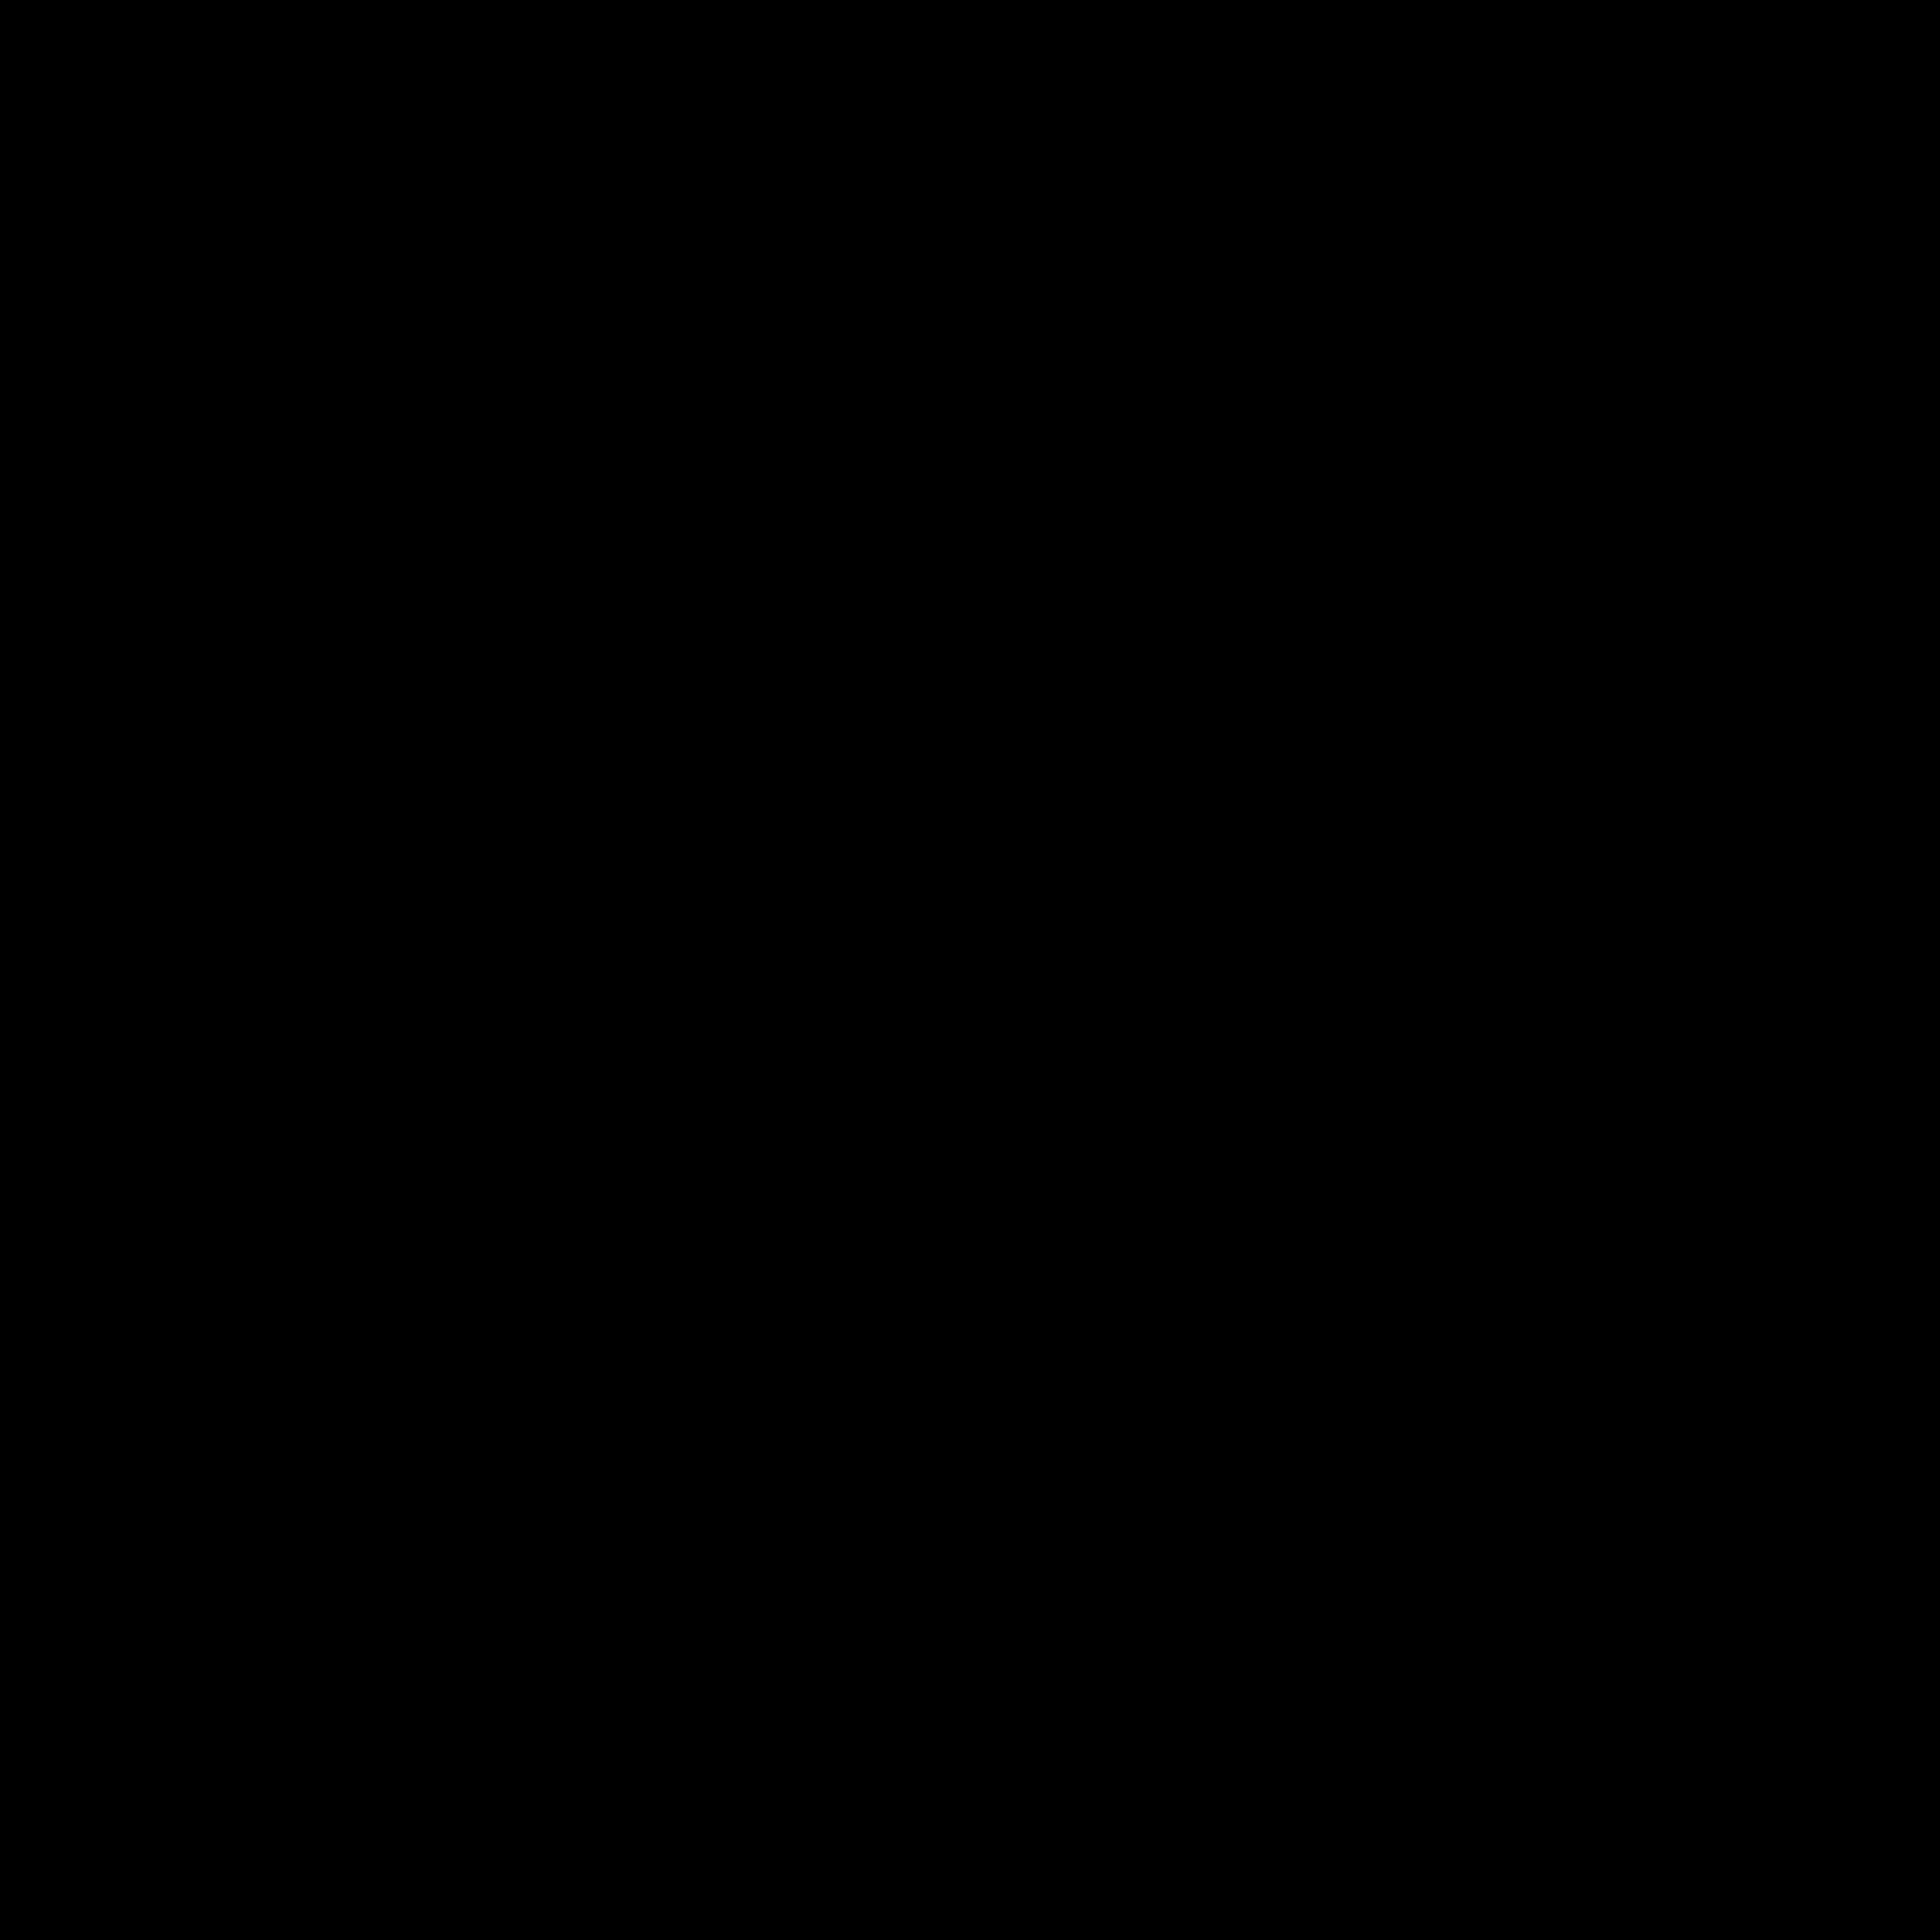 EVERFOAM 35 ES, 1822 - AZODICARBONAMMIDE